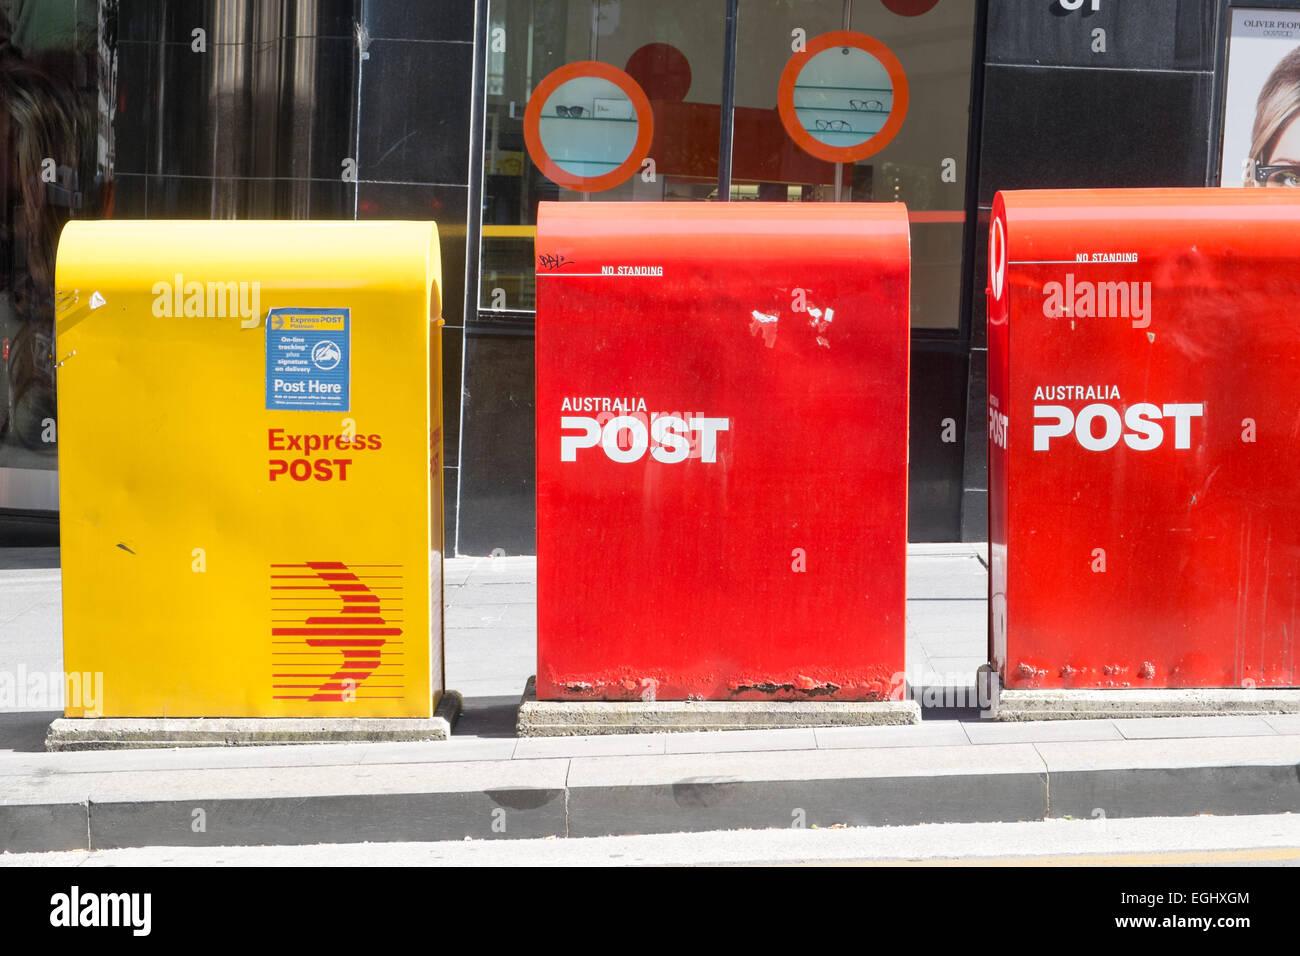 australia post mailboxes in Sydney Stock Photo: 79070004 - Alamy